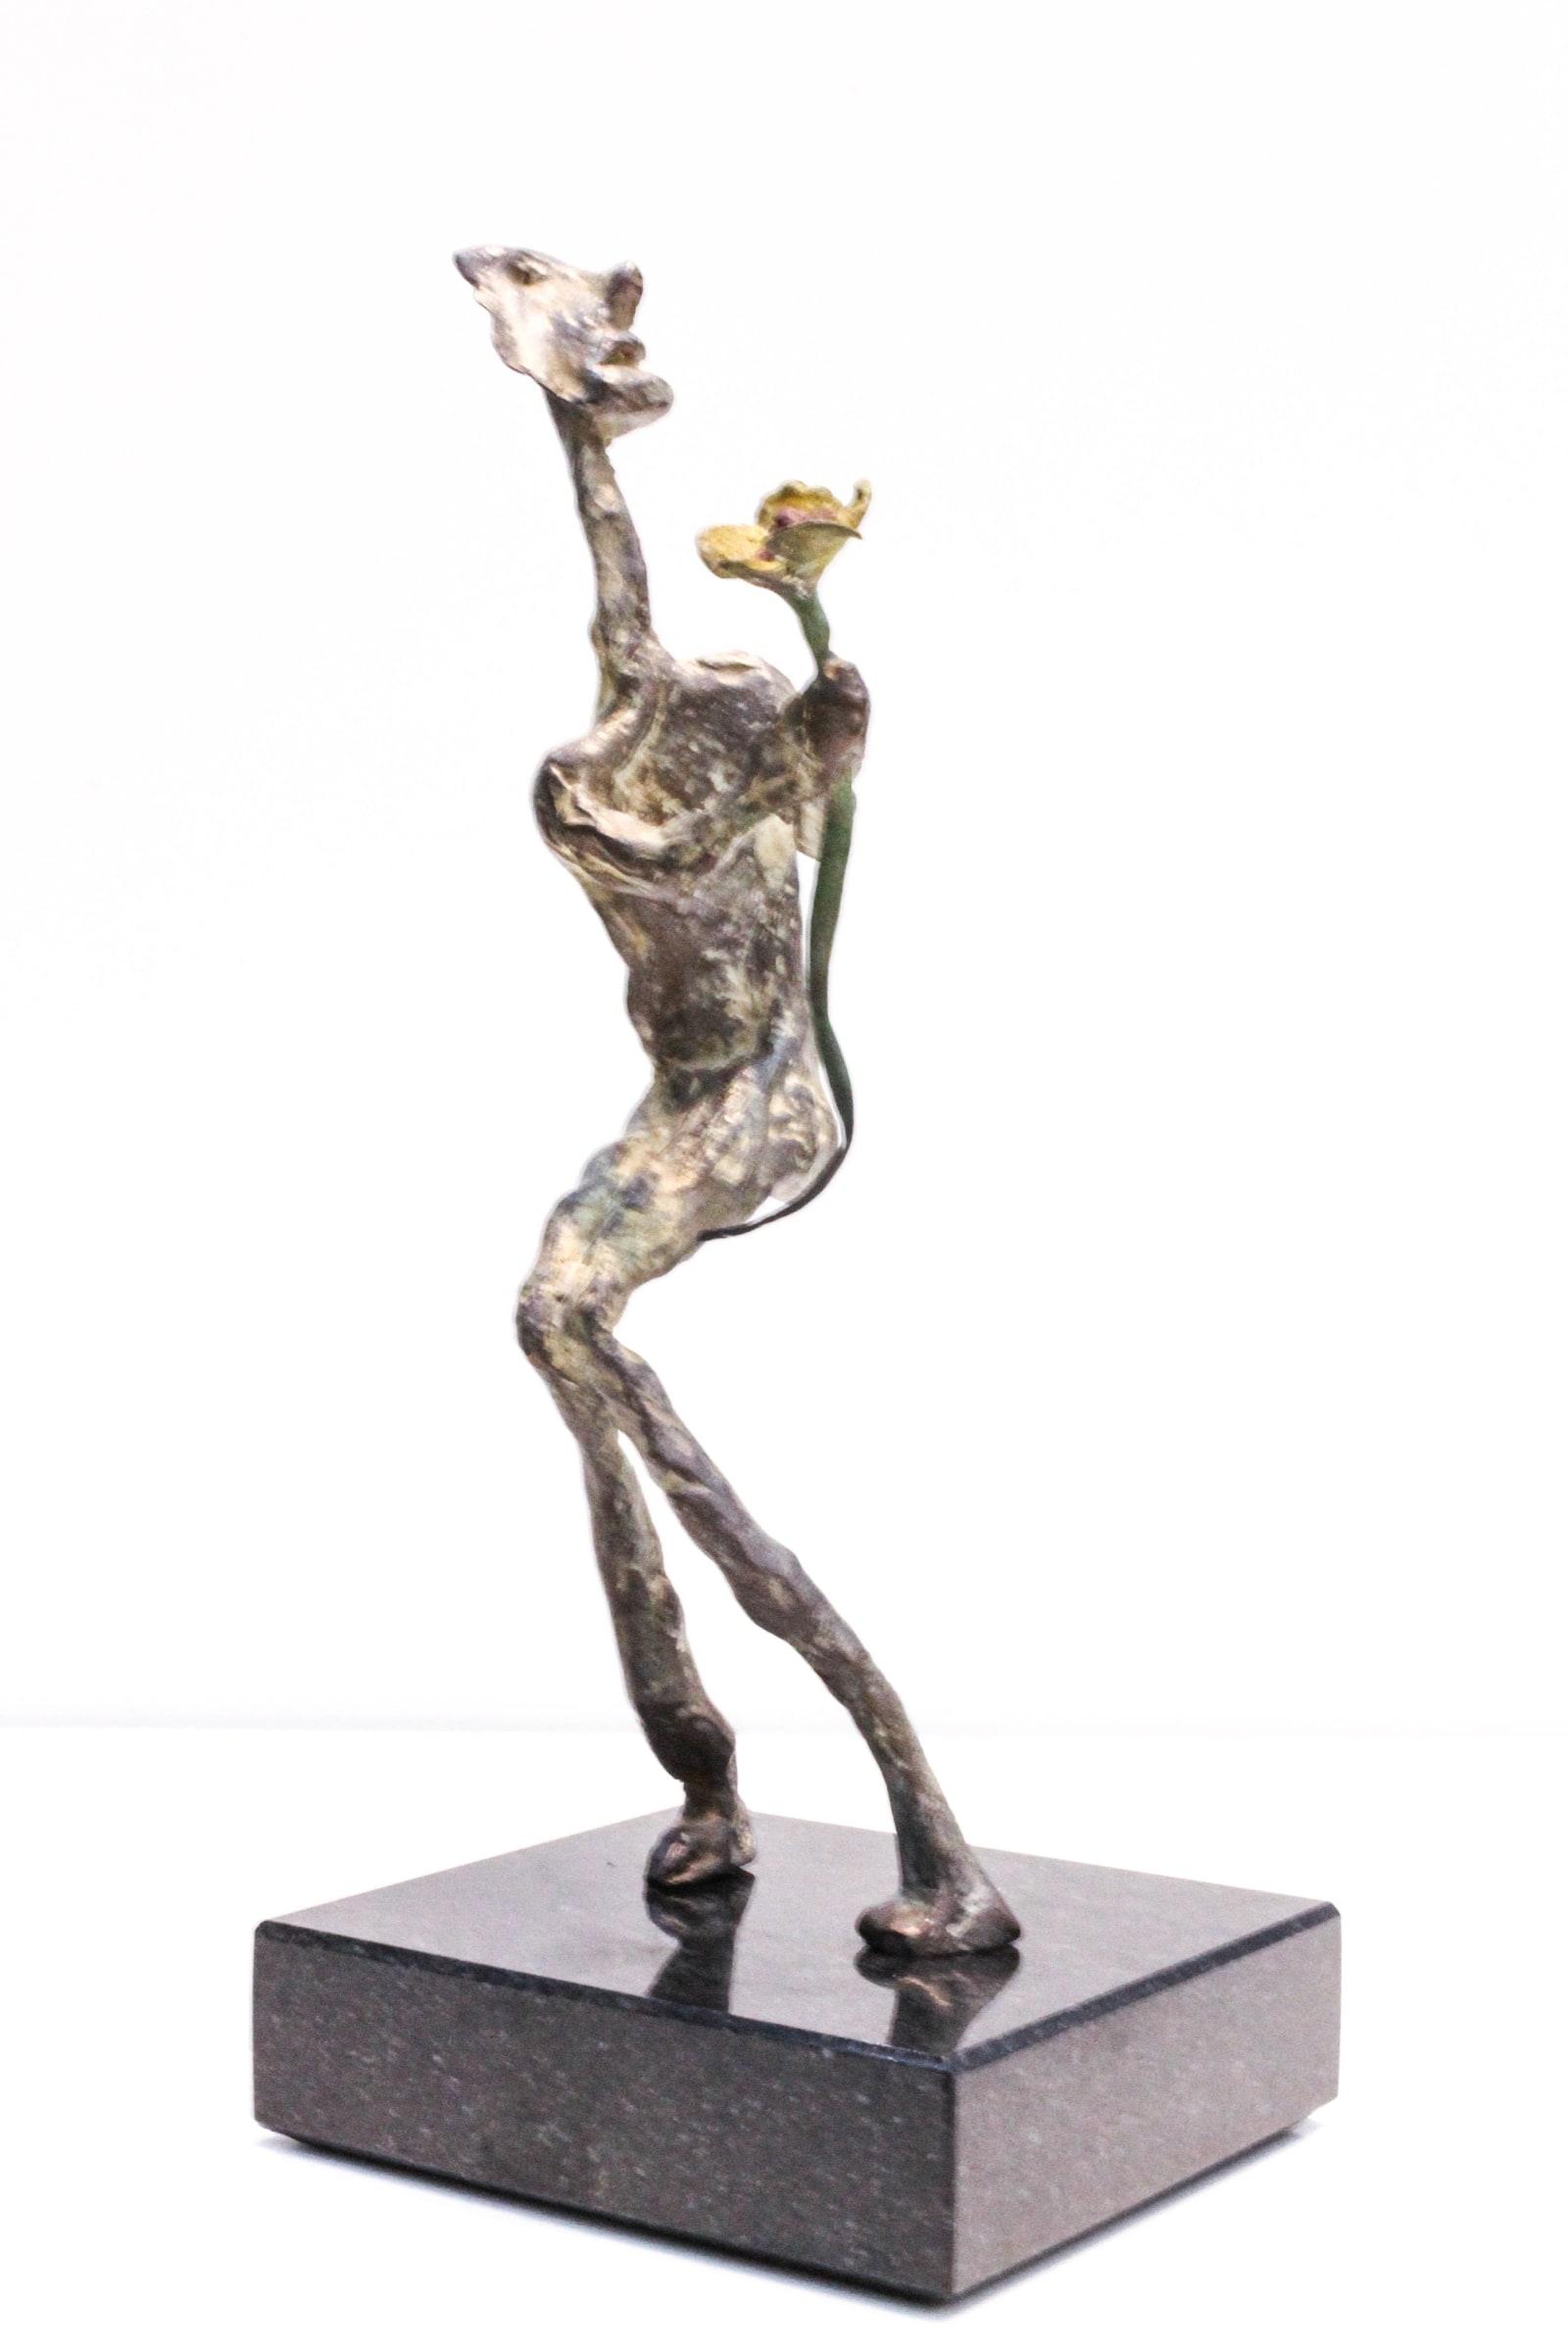 <span class=&#34;link fancybox-details-link&#34;><a href=&#34;/artists/82-jaco-kruger/works/1548-jaco-kruger-flower-seller/&#34;>View Detail Page</a></span><div class=&#34;artist&#34;><strong>Jaco Kruger</strong></div> <div class=&#34;title&#34;><em>Flower Seller</em></div> <div class=&#34;medium&#34;>Bronze Sculpture</div> <div class=&#34;dimensions&#34;>10cm x 10cm x 24.1cm</div> <div class=&#34;edition_details&#34;>4/8</div><div class=&#34;price&#34;>R7,600.00</div>